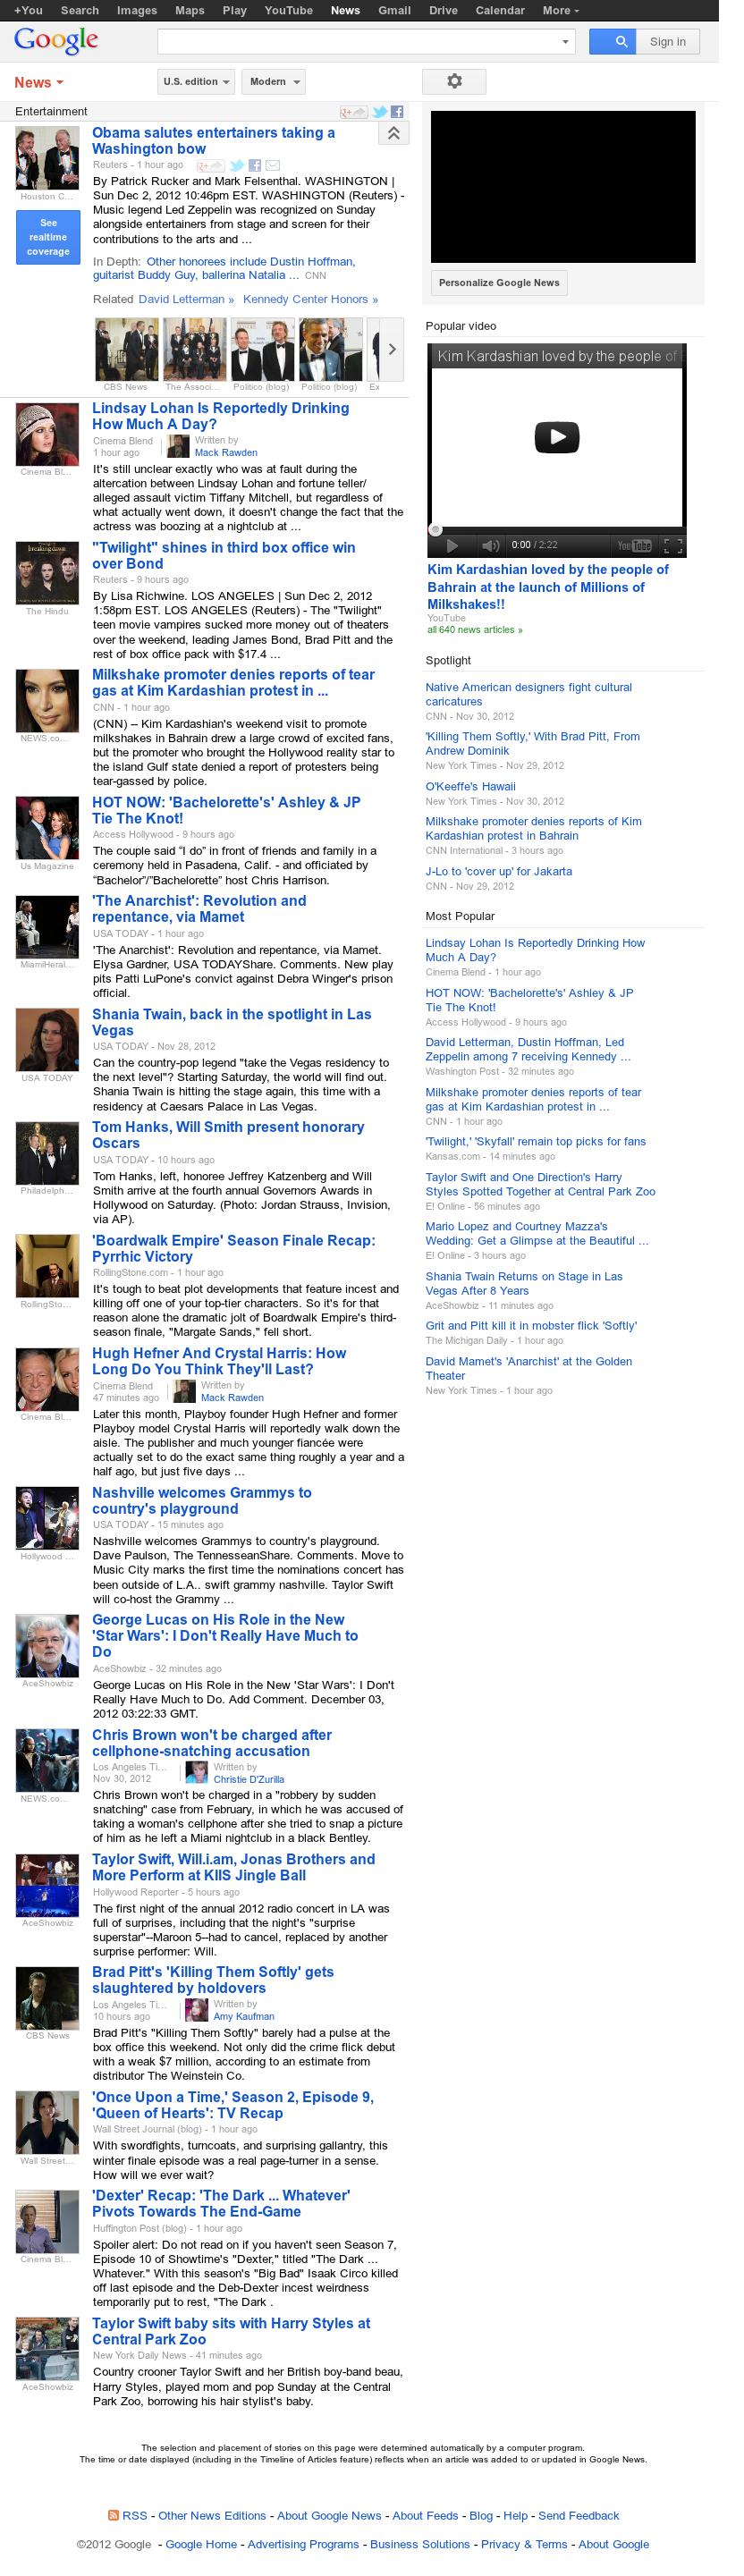 Google News: Entertainment at Monday Dec. 3, 2012, 4:13 a.m. UTC